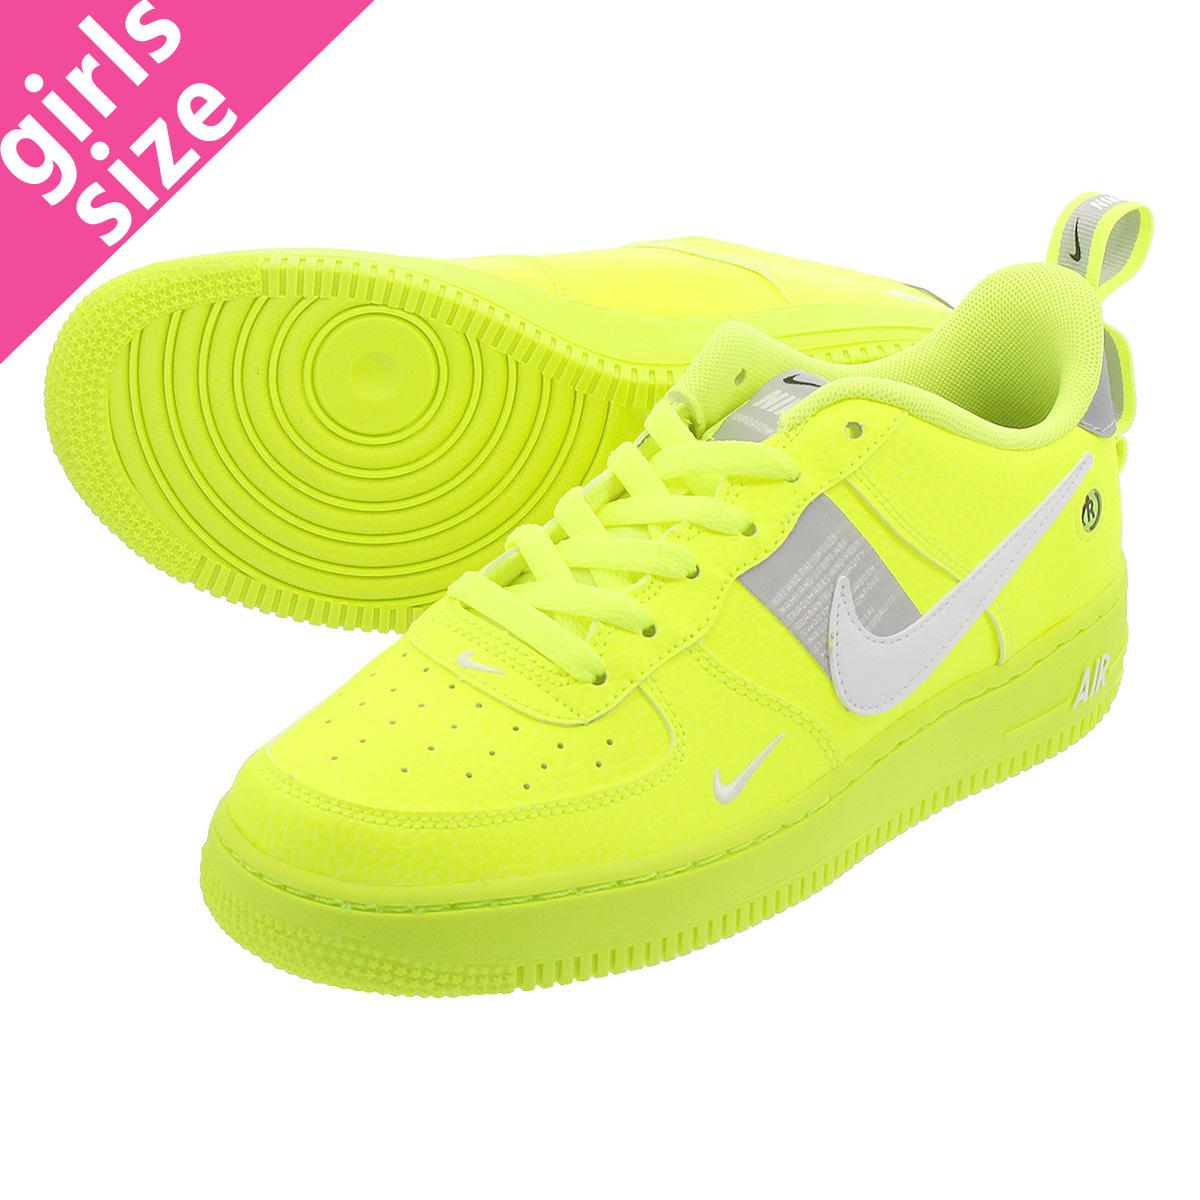 Nike Air Force 1 LV8 Utility GS Volt Green White Wolf Grey Juniors AR1708 700